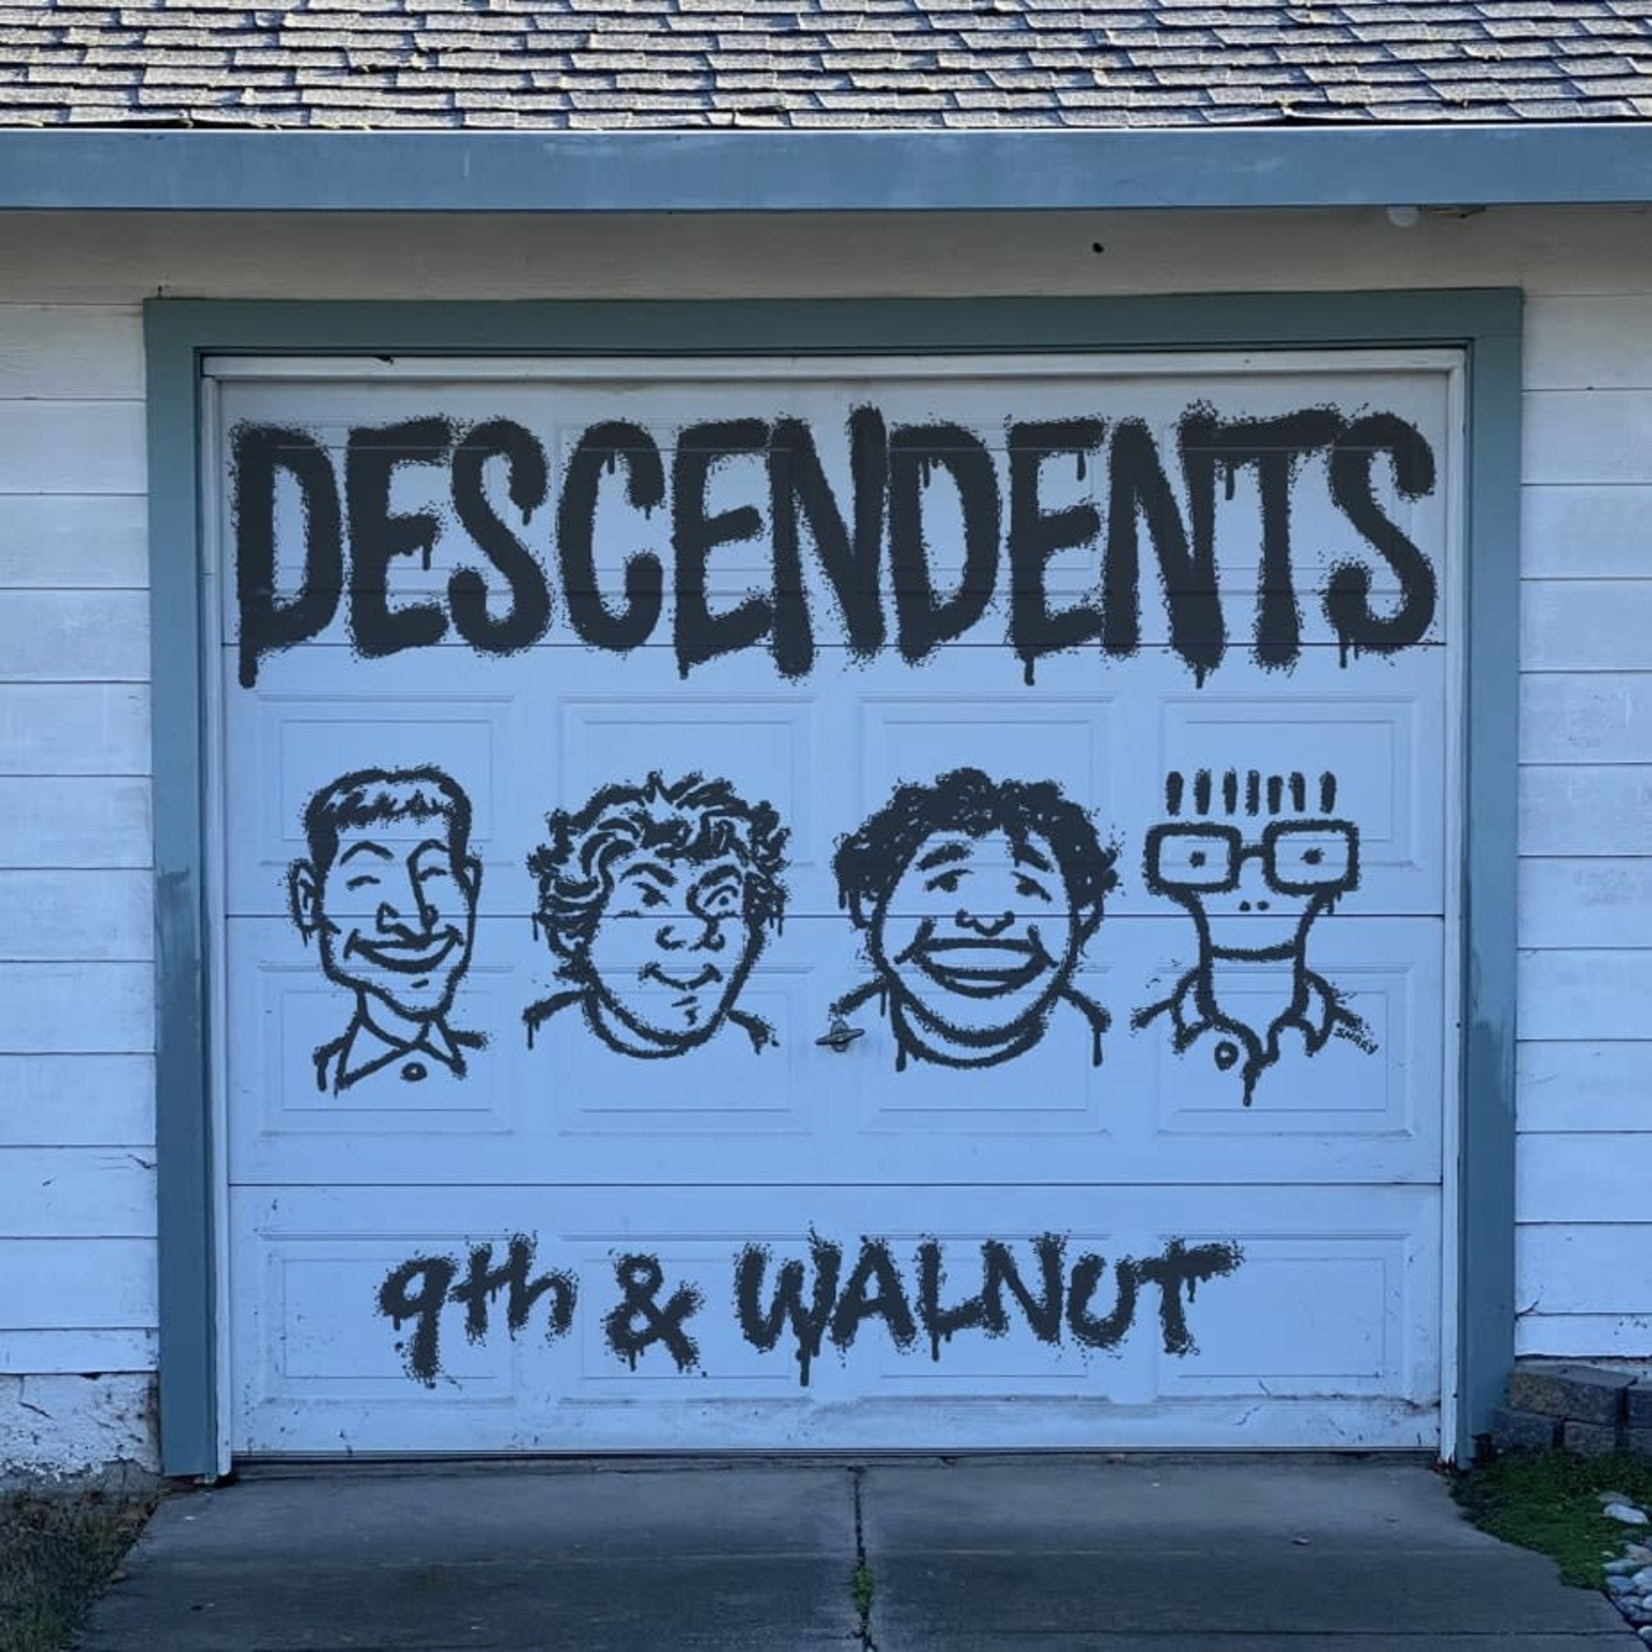 [New] Descendents: 9th & Walnut